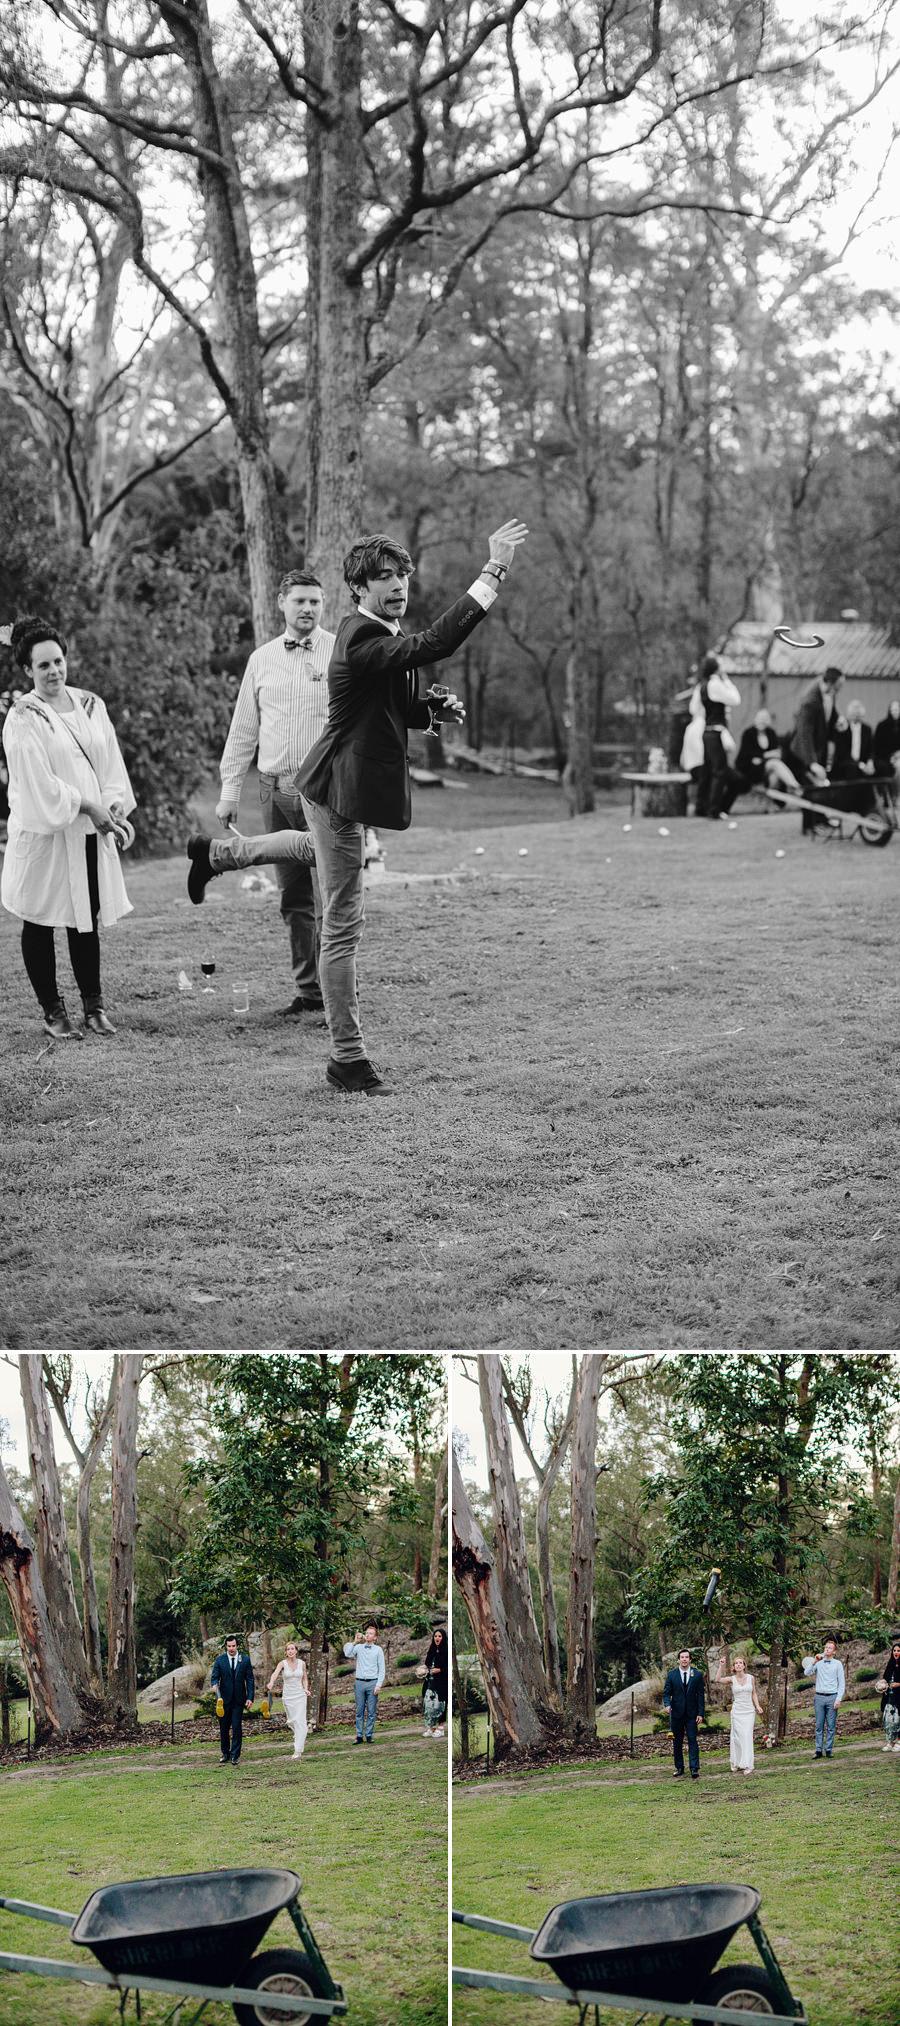 Modern Wedding Photography: Lawn Games